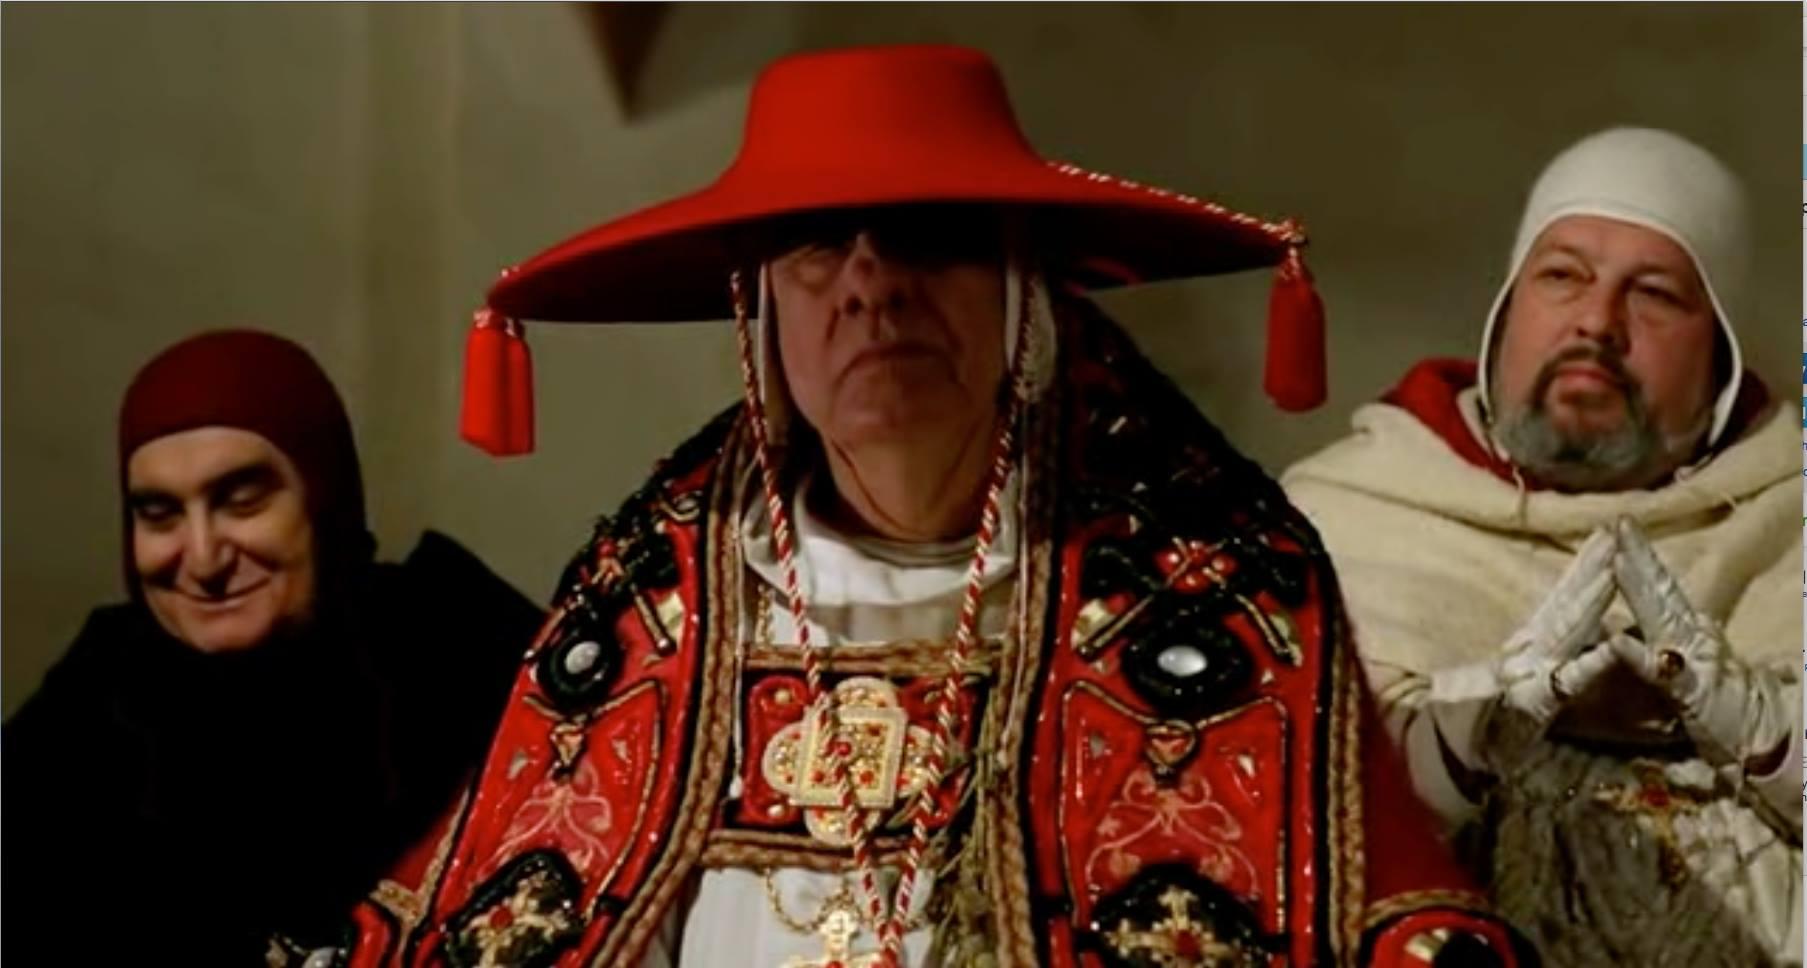 kolínský arcibiskup